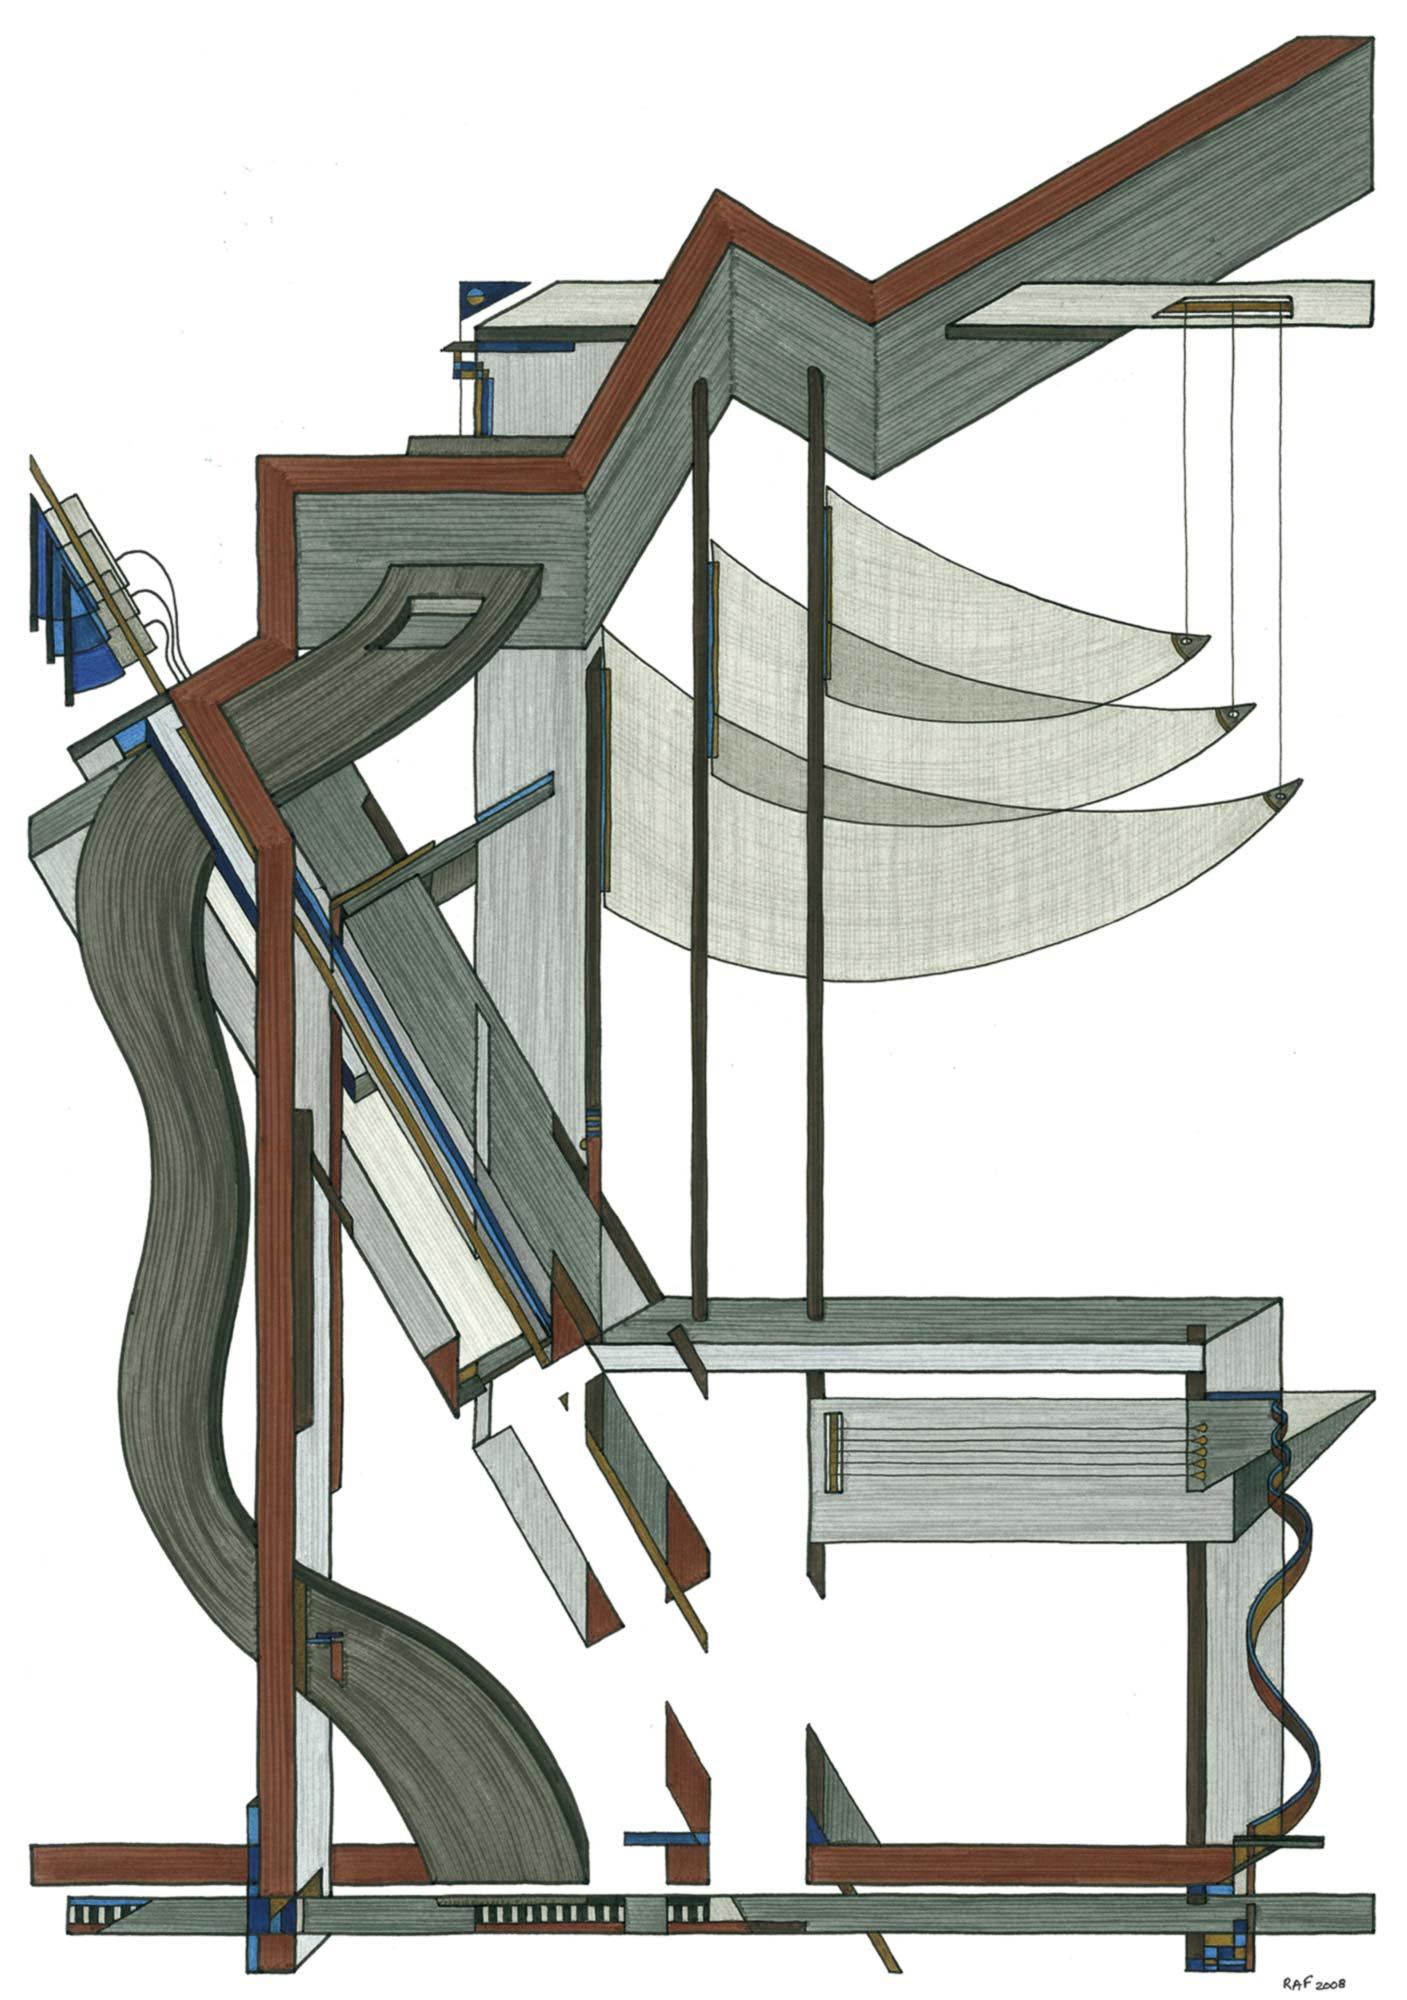 Suspendu, dessin, Raf Listowski, 2008